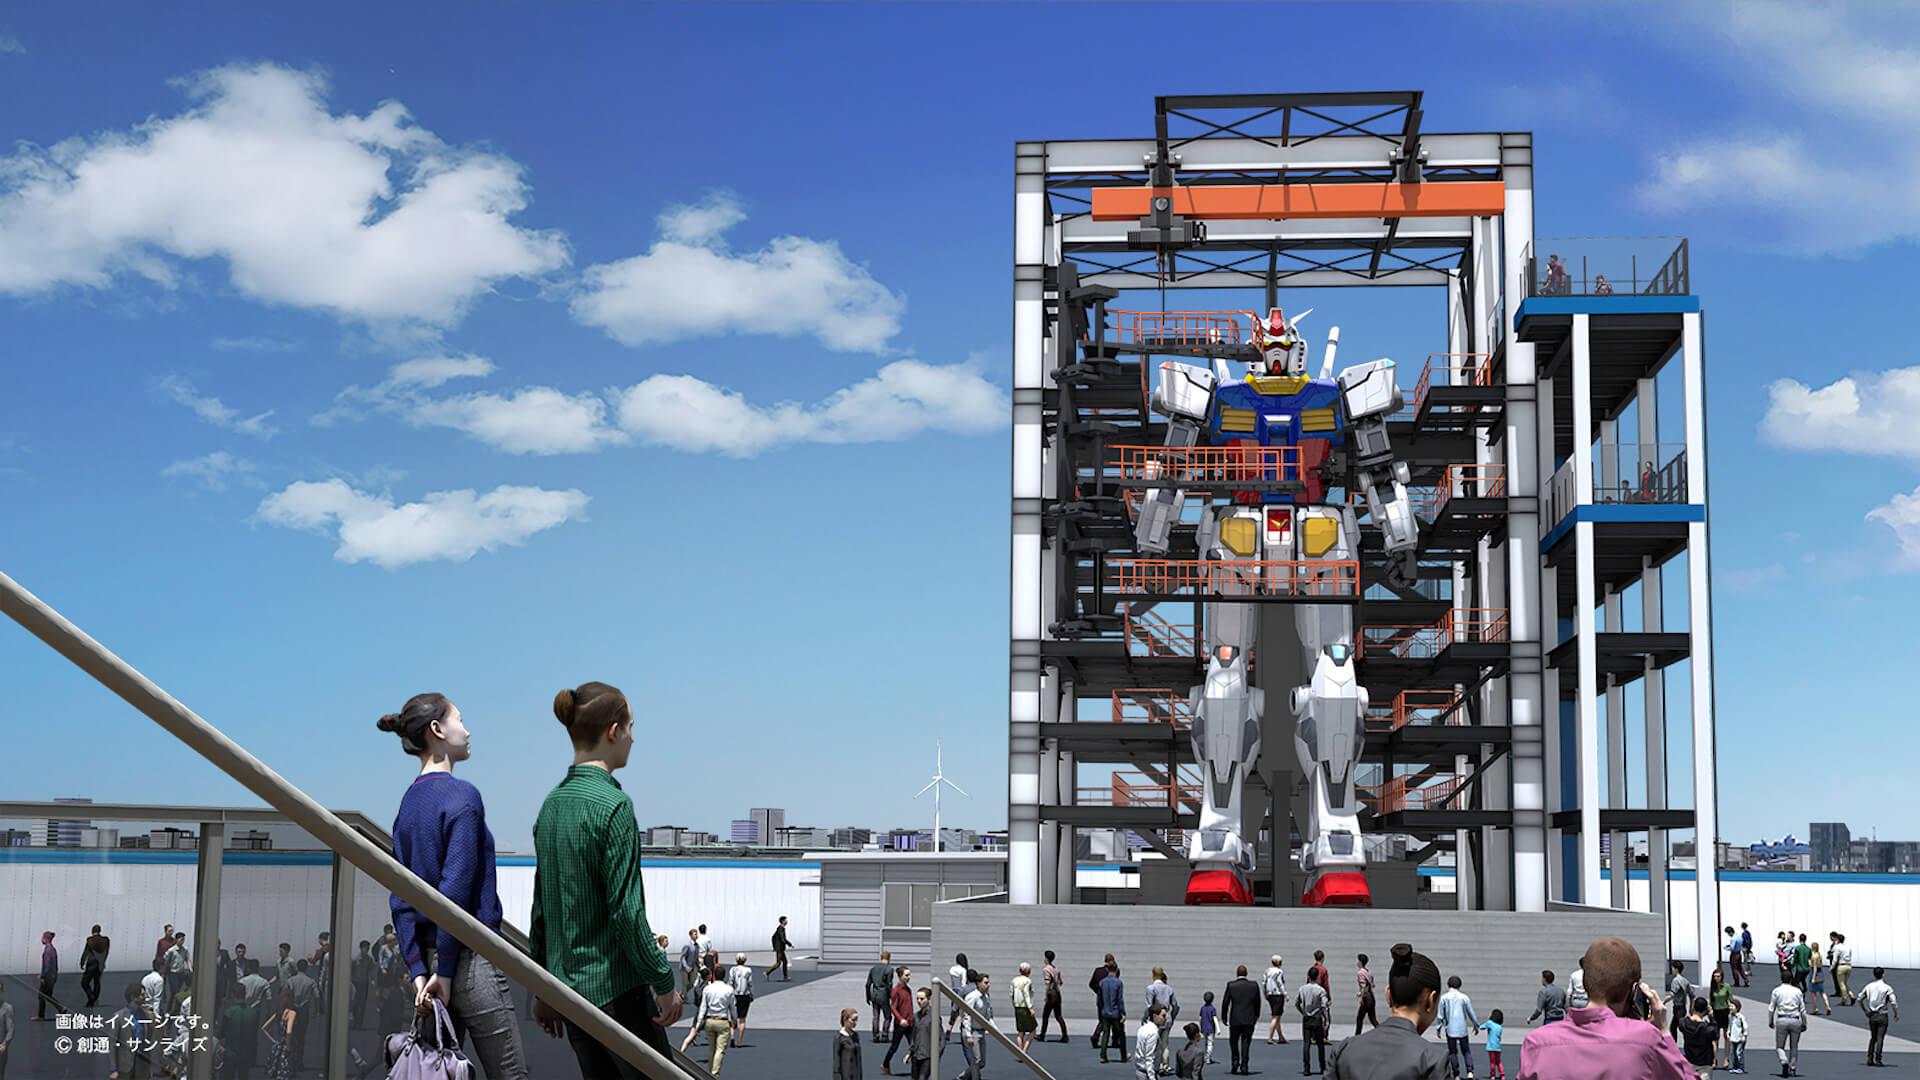 18mの動く実物大ガンダムが横浜に!「GUNDAM FACTORY YOKOHAMA」10月オープン art200120_gundam_4